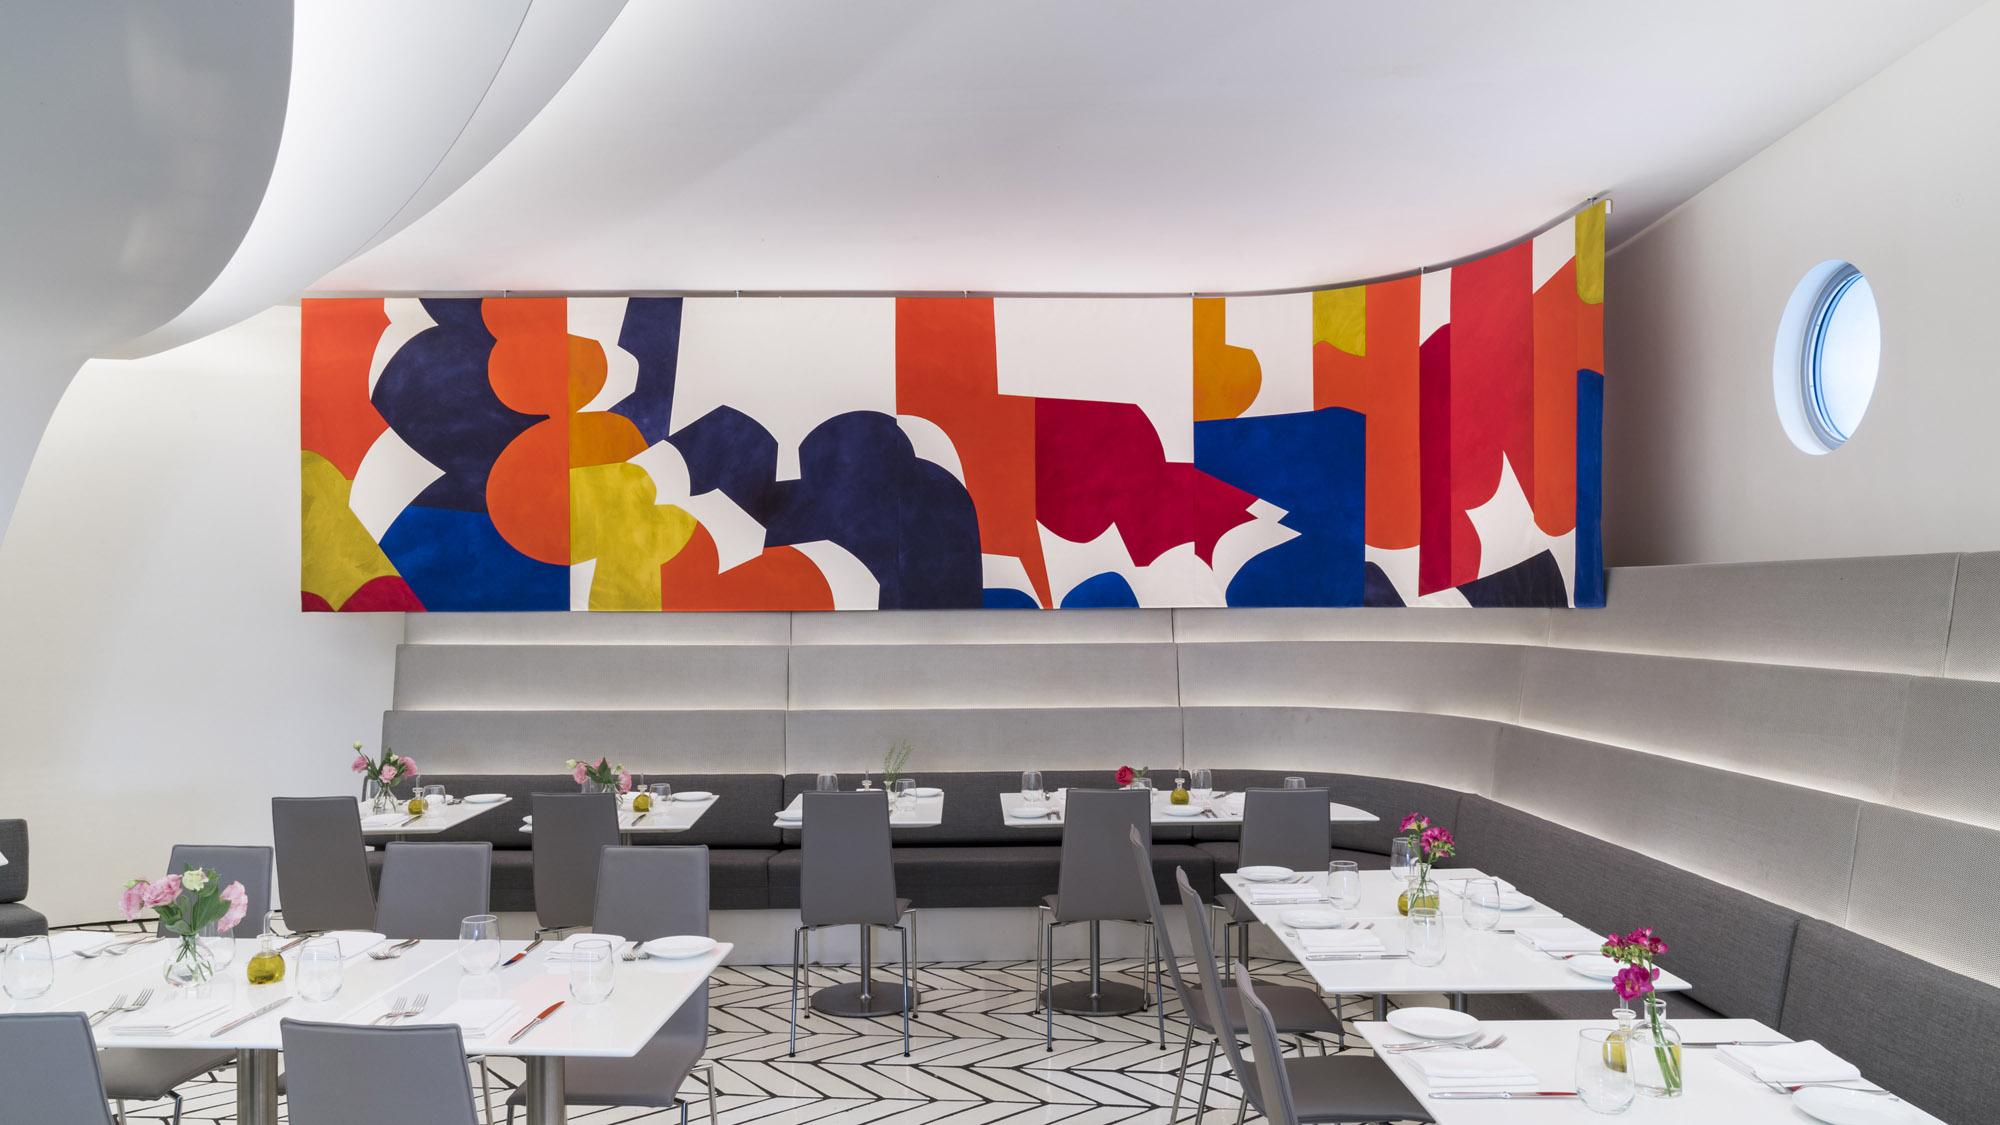 Walk Inside the Art: Sarah Crowner's New Installation in ...  Guggenheim Inside